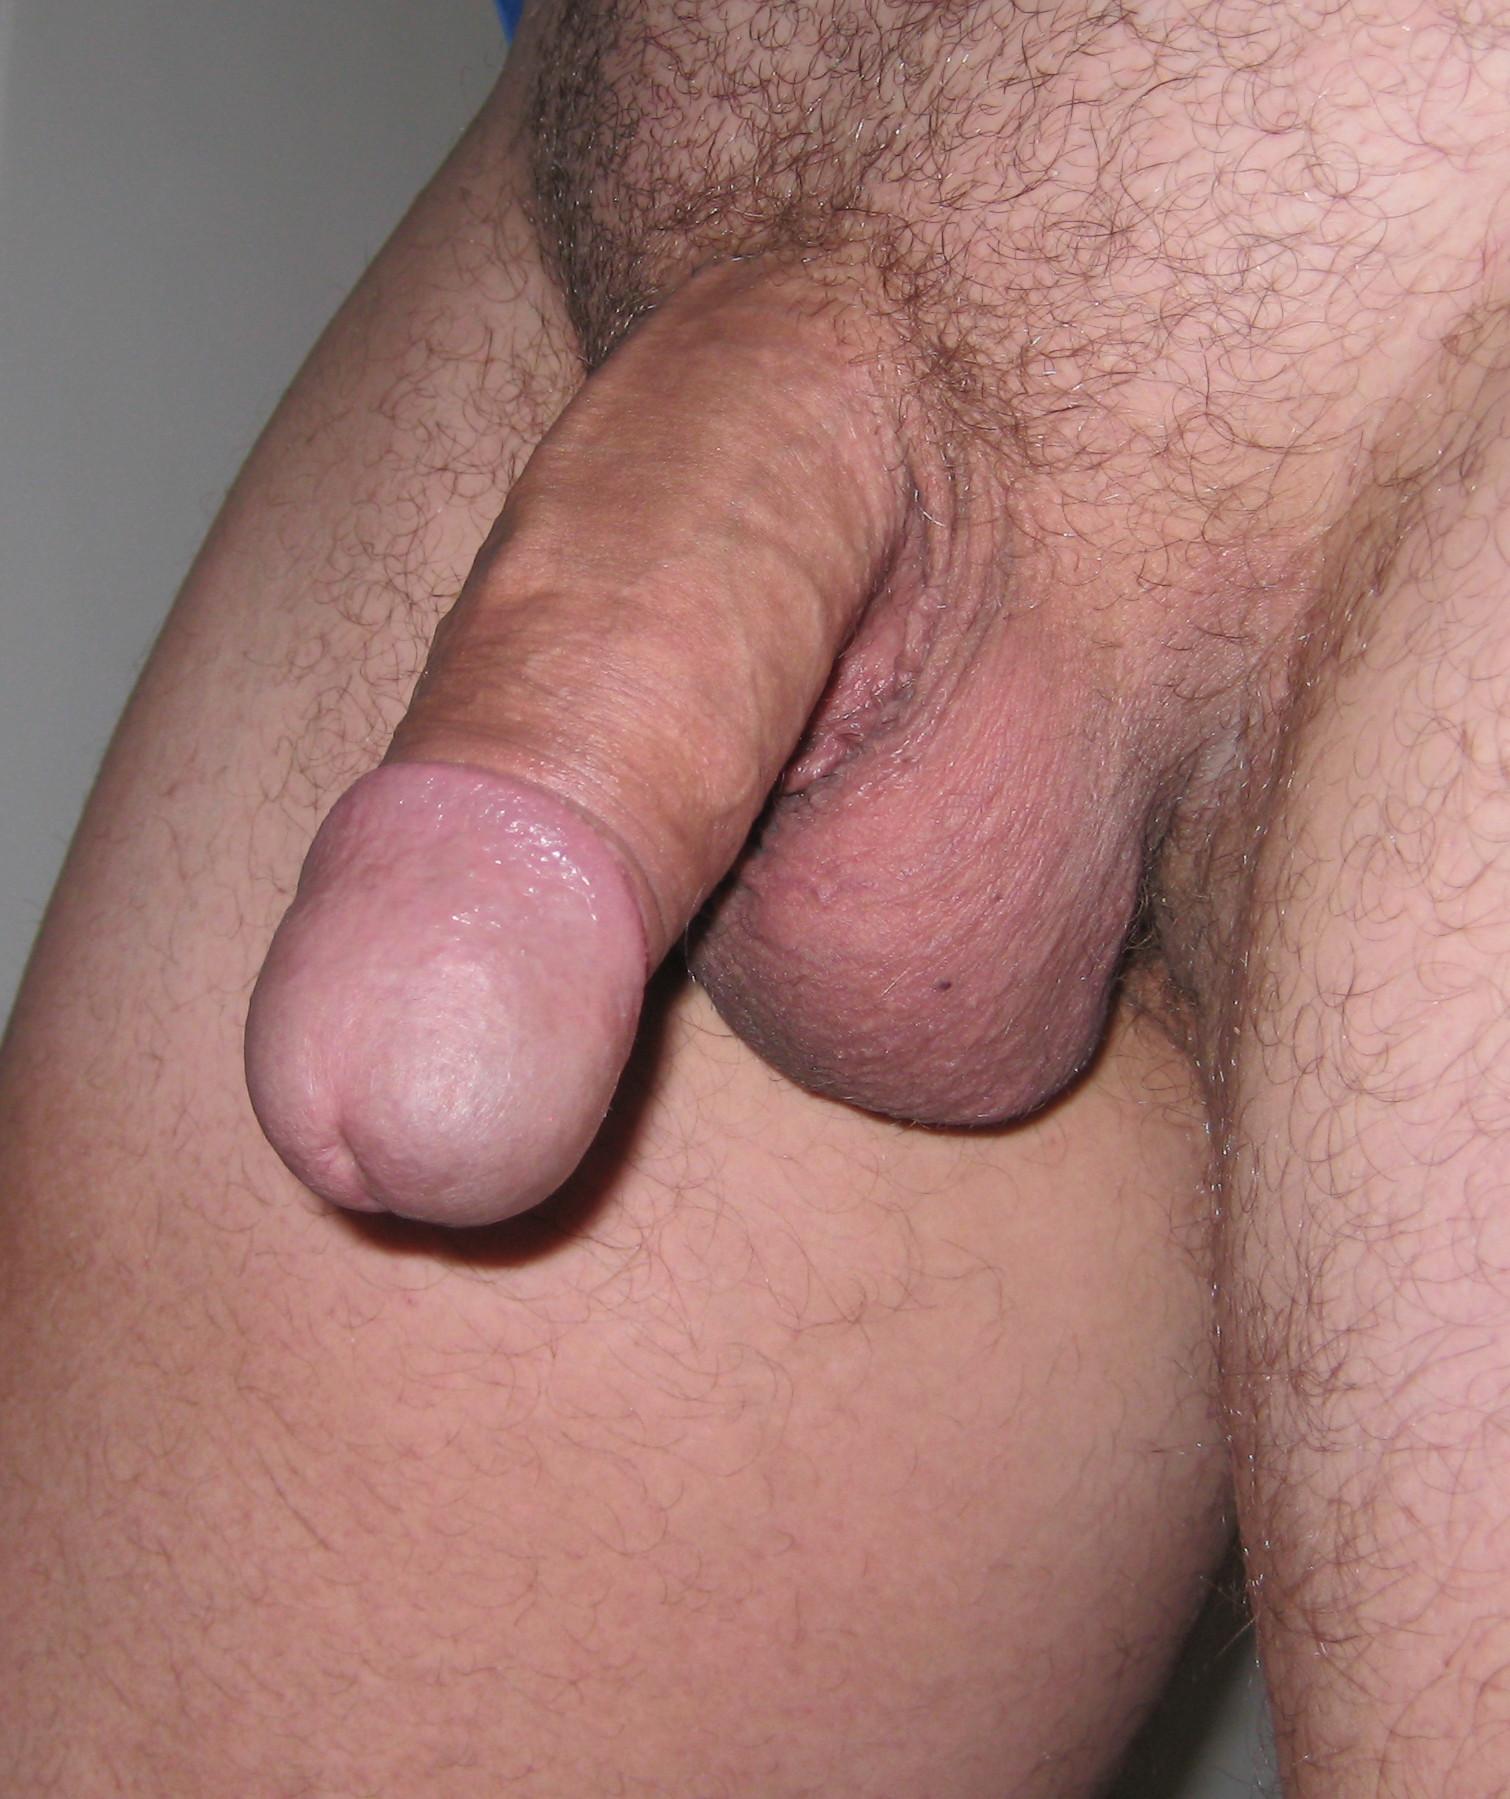 penis verstecken sexspielzeug selbst